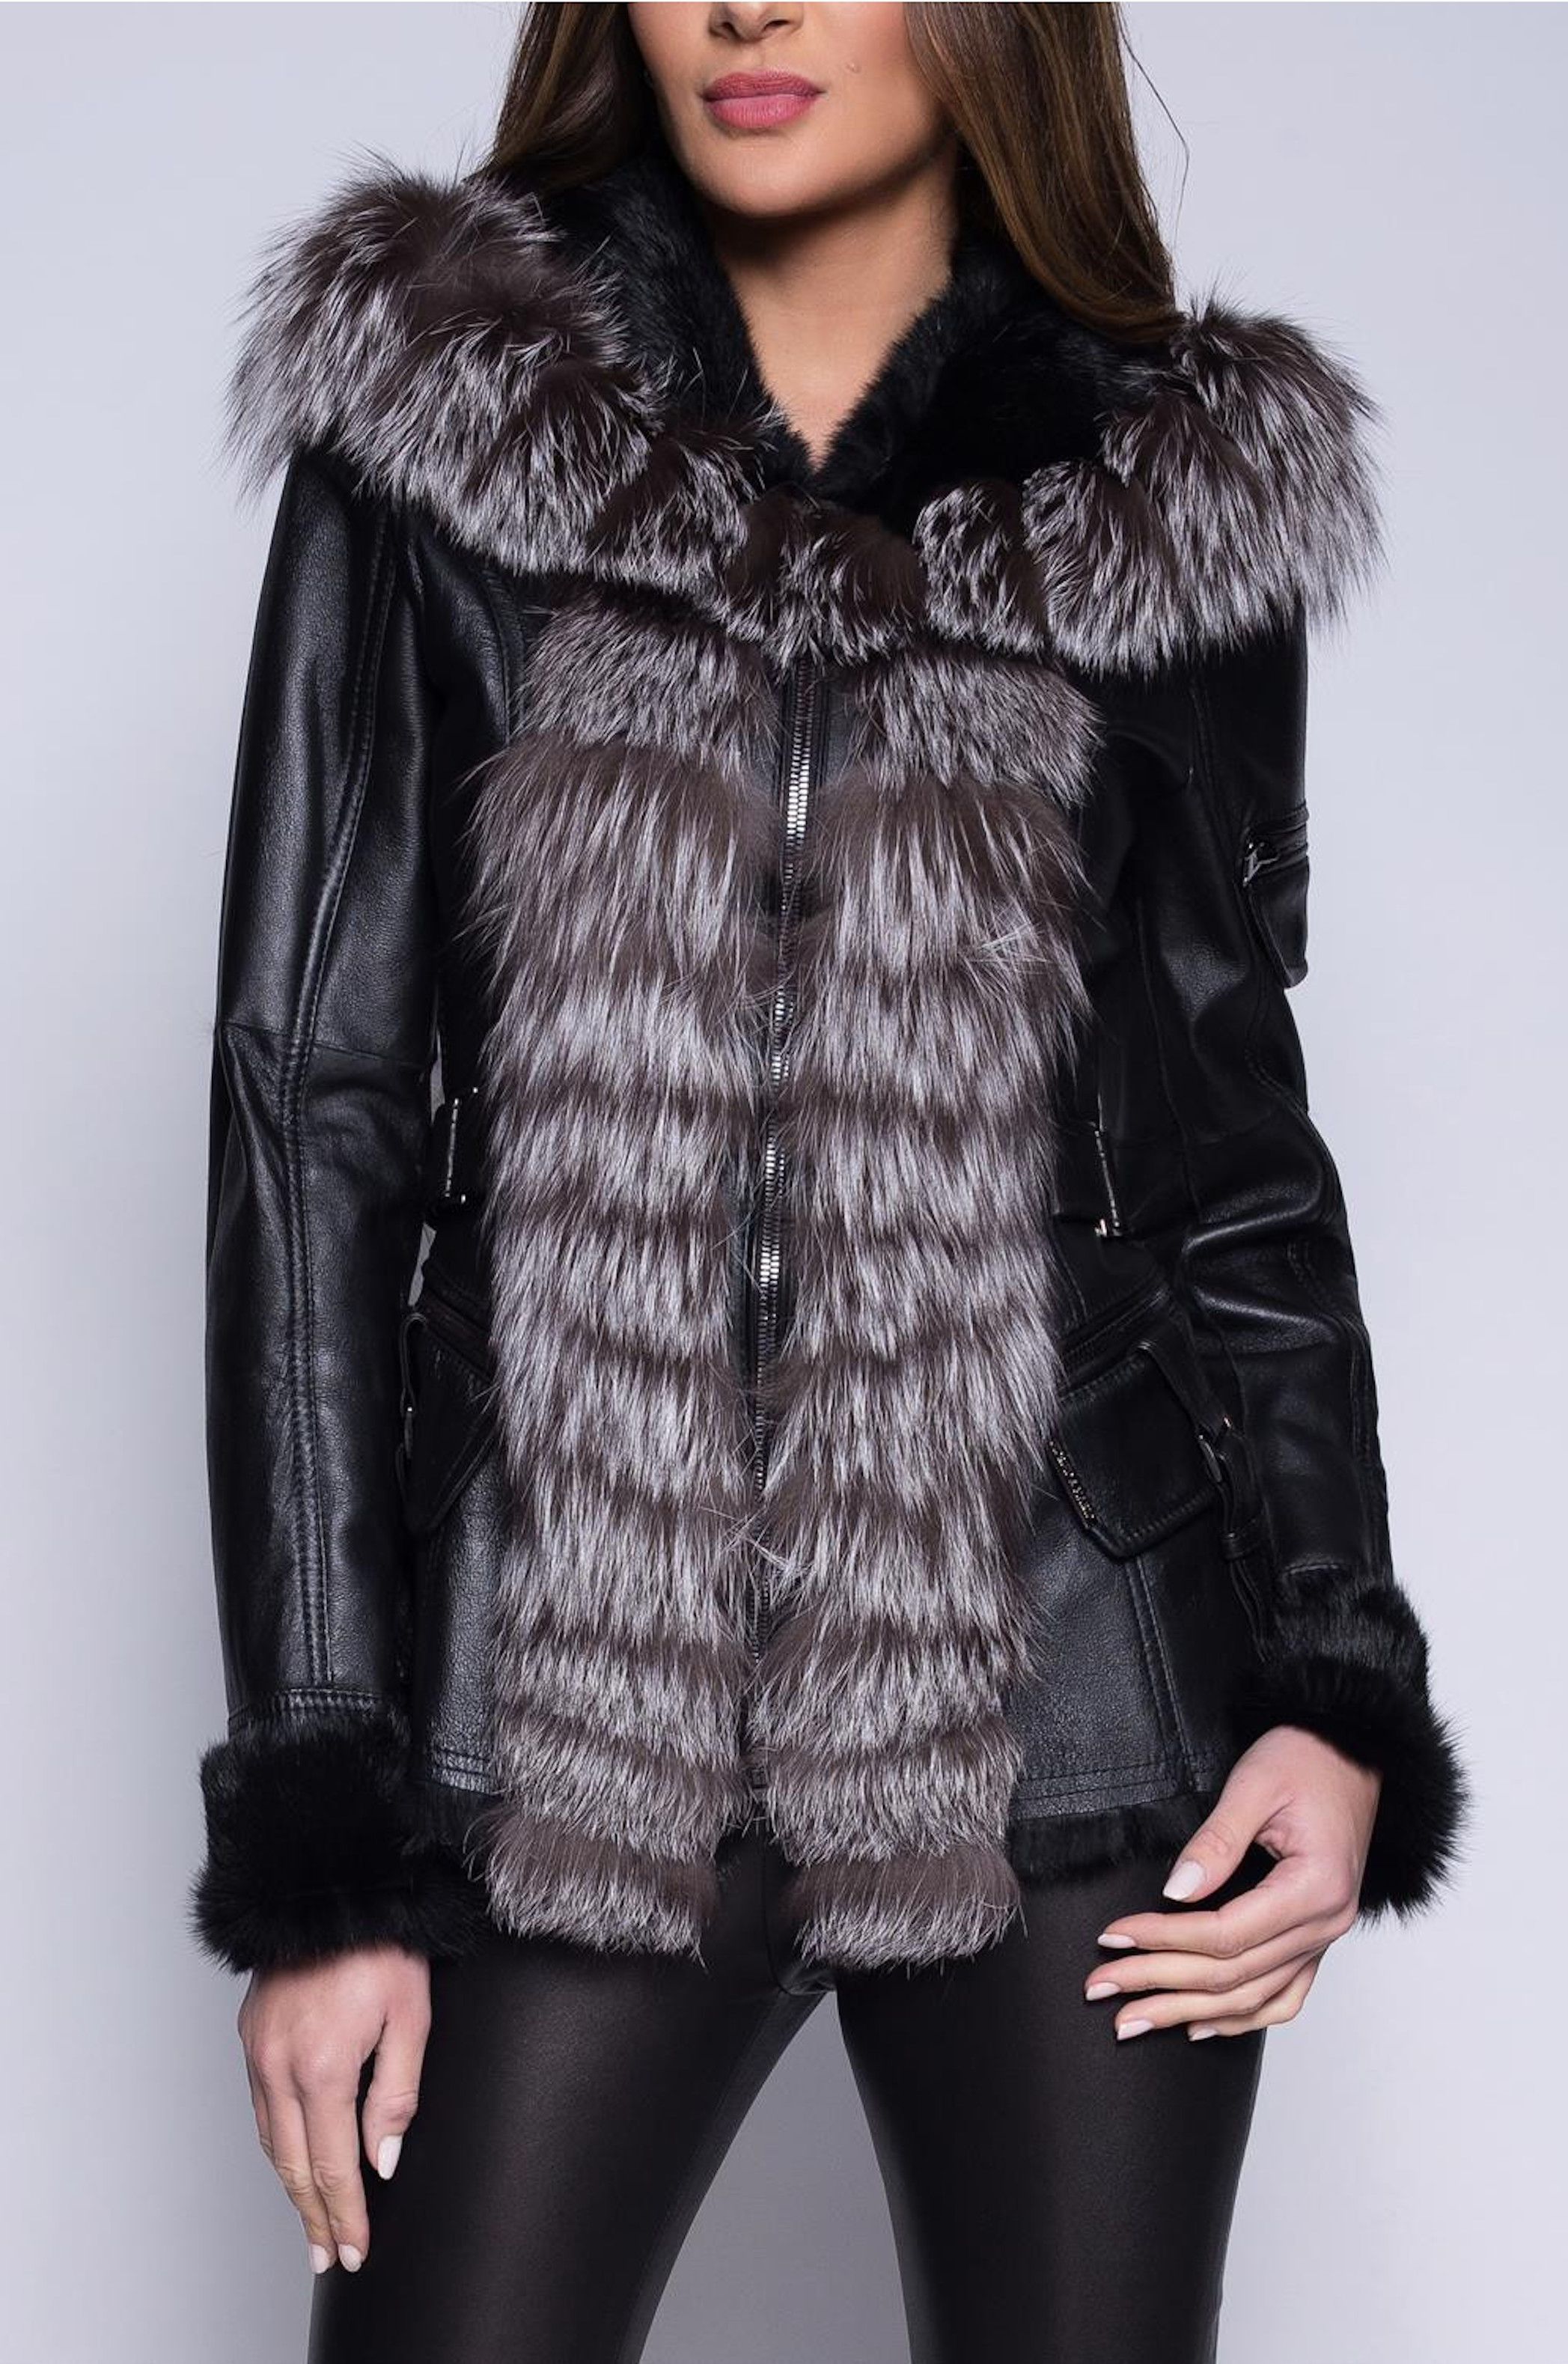 Černá kožená bunda lemovaná mývalí kožešinou